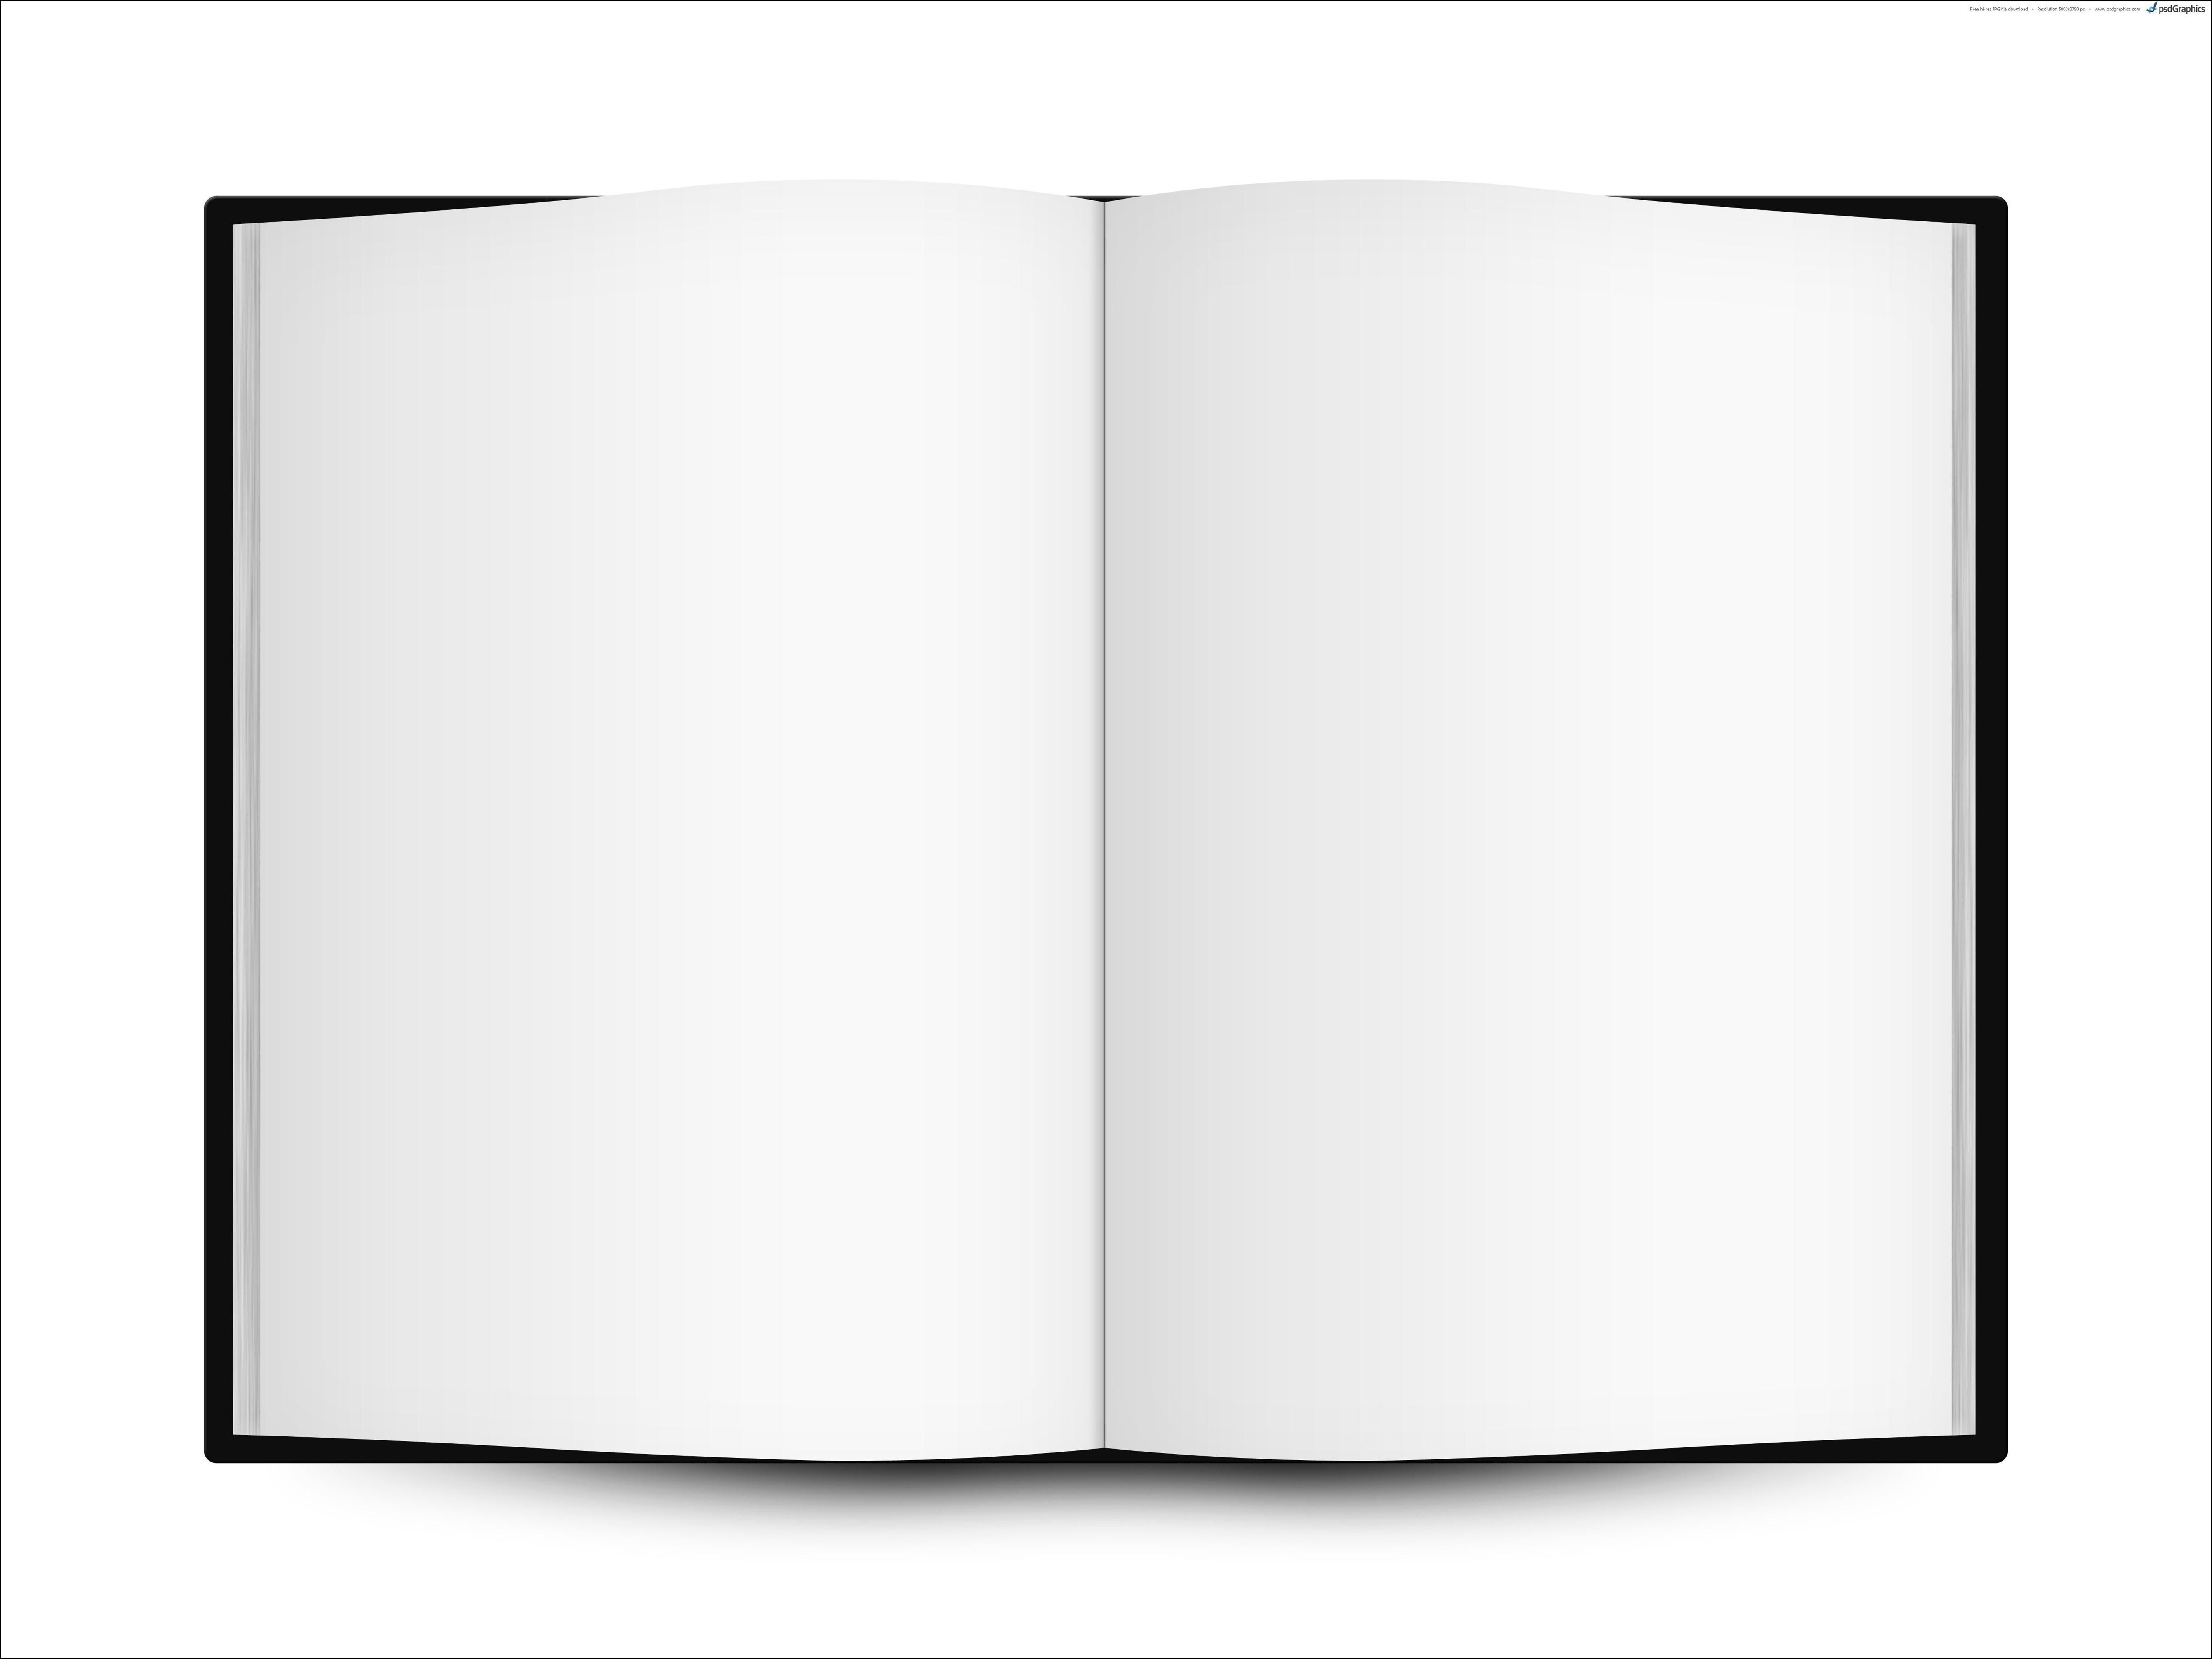 5354x4016 Blank Open Book Template Sample Invitations